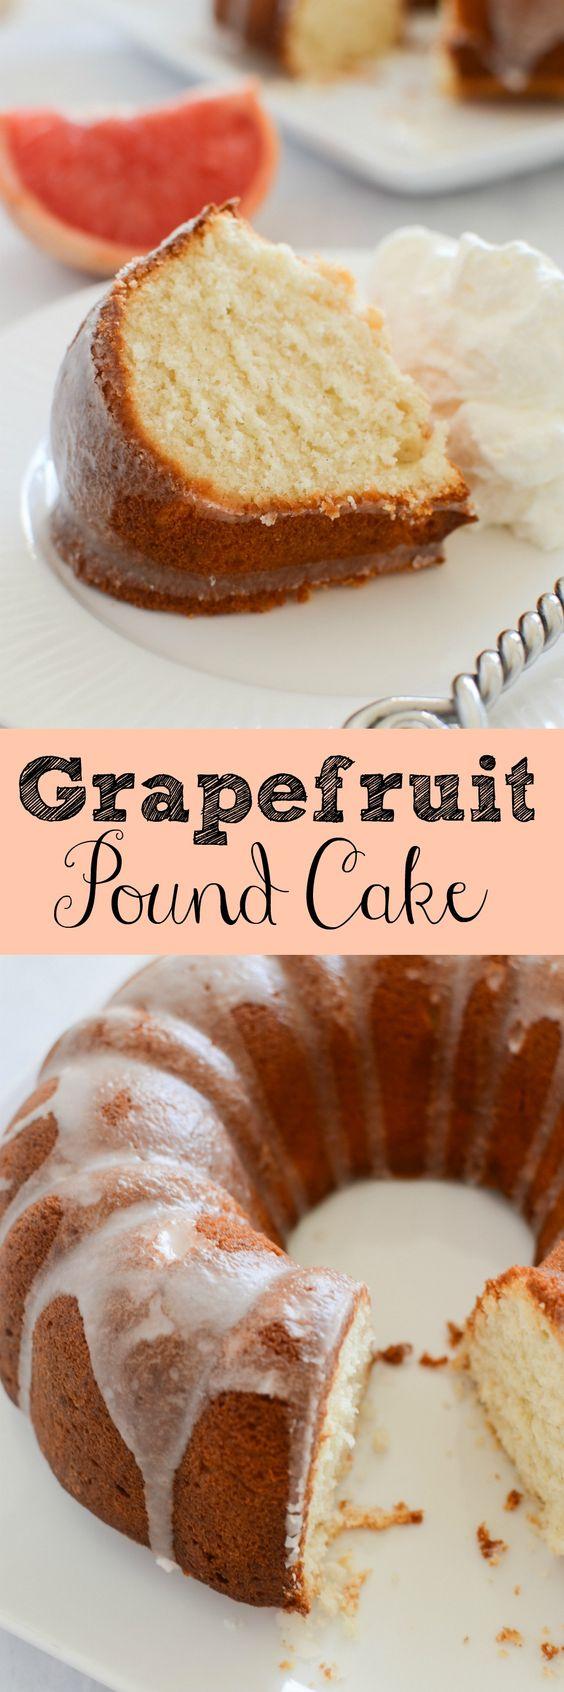 Grapefruit Pound Cake - the perfect spring dessert! Bright and ...